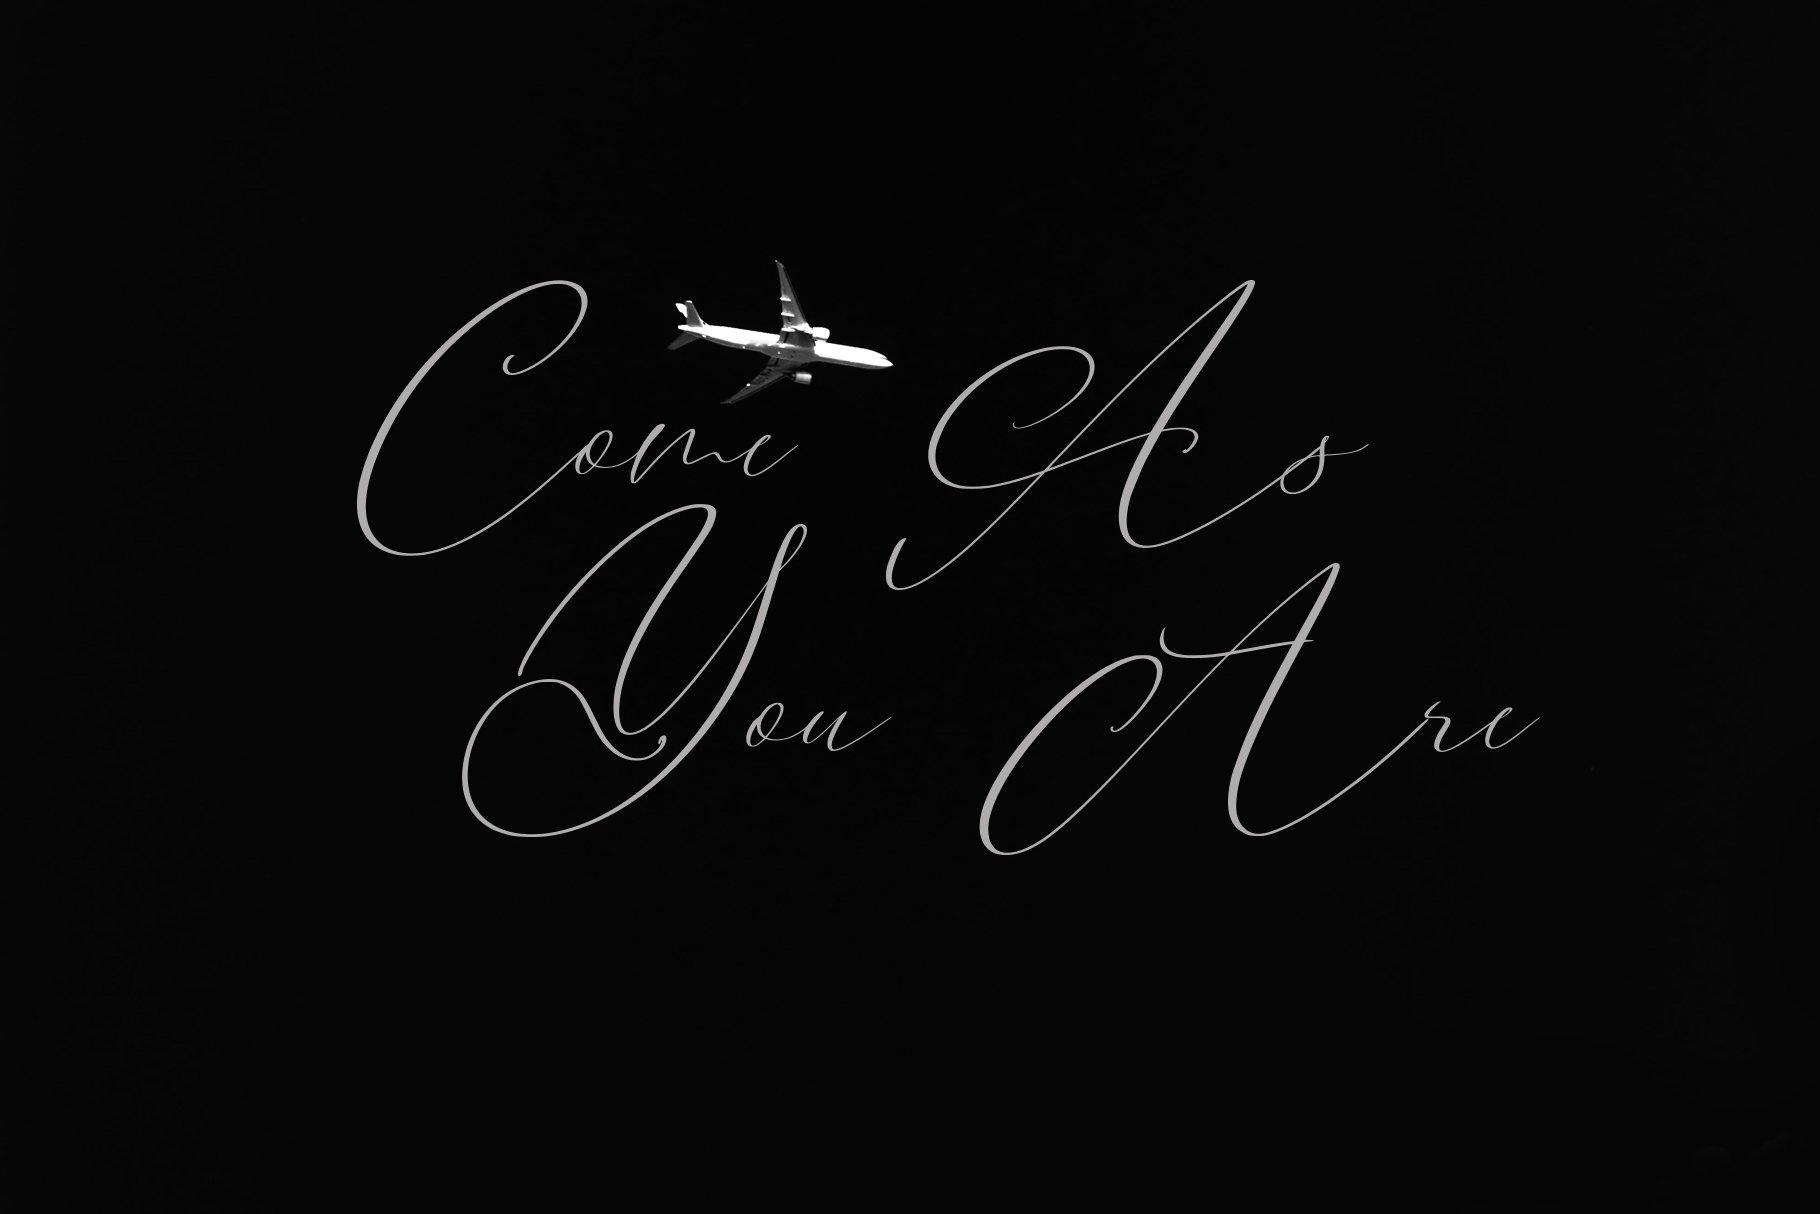 Black Cabaret Script Font & Logos example image 8